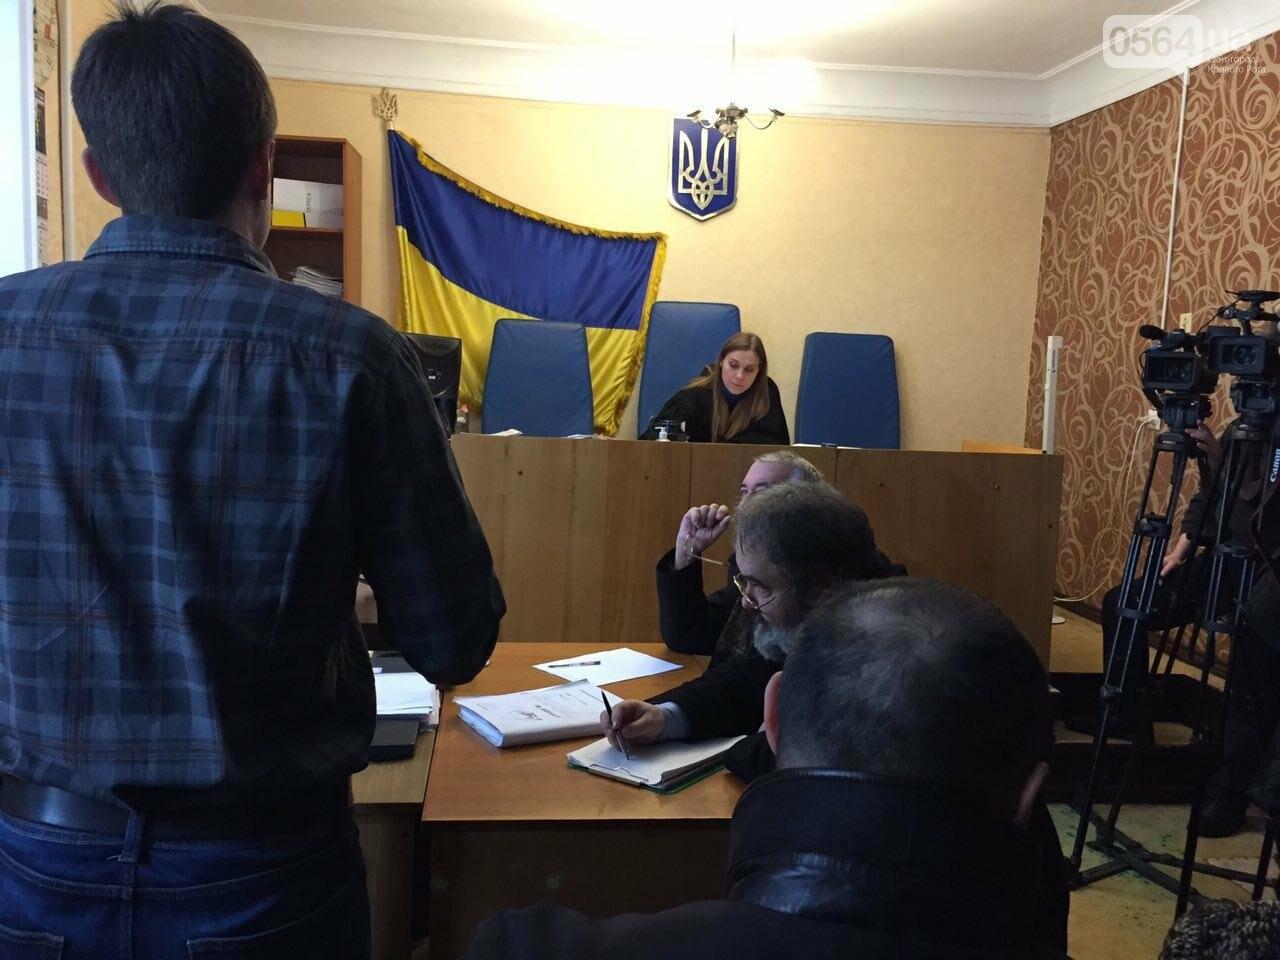 Криворожских журналистов в суде  допрашивают по делу Вячеслава Волка (ФОТО), фото-8